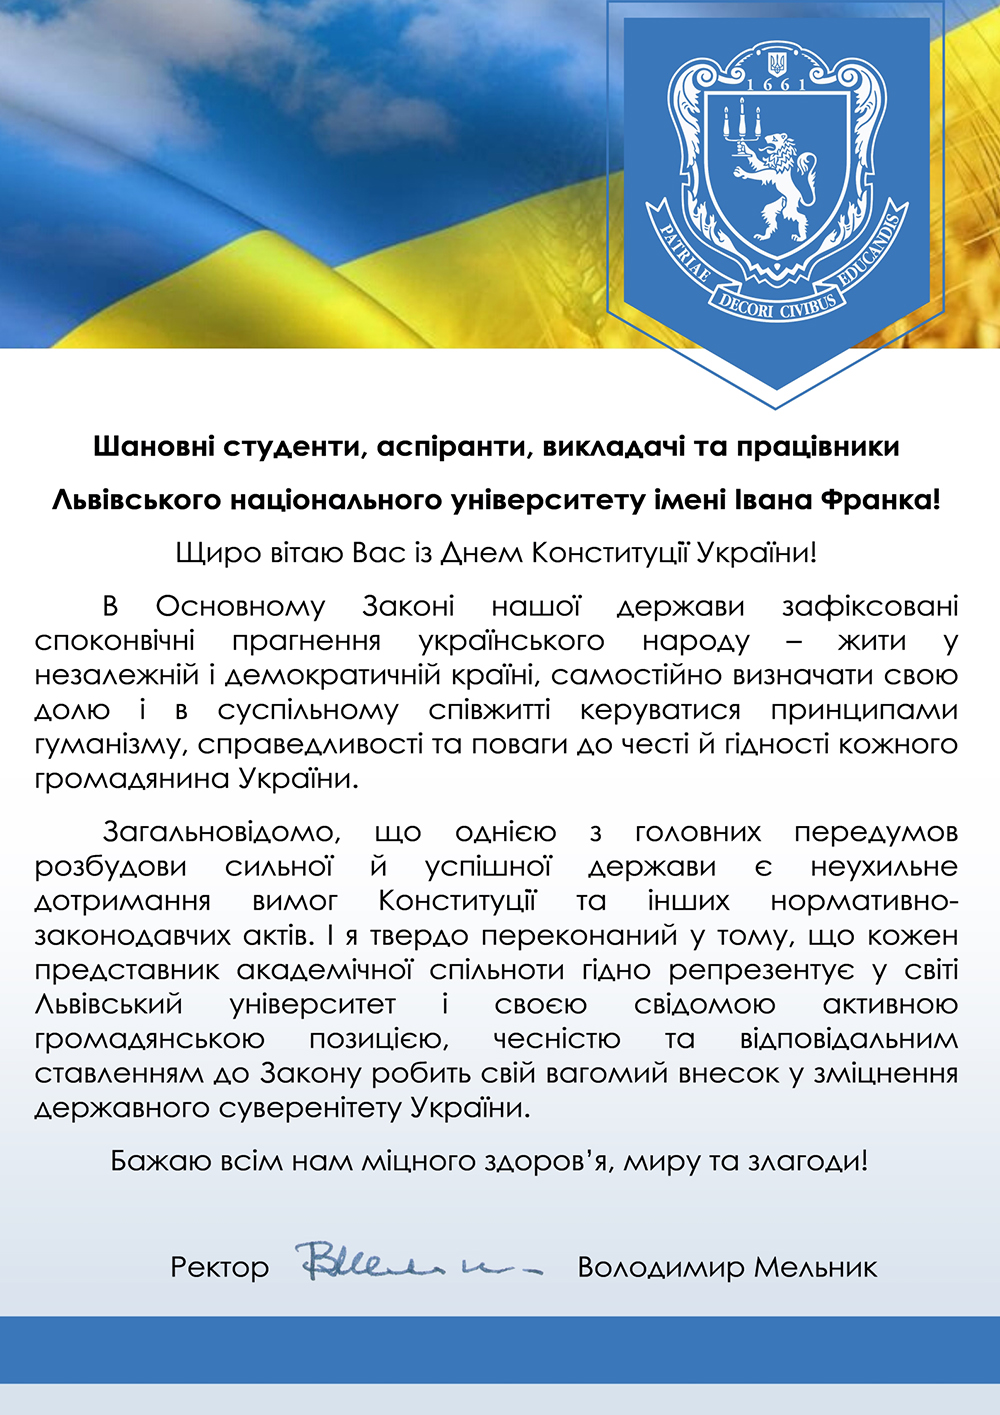 https://www.lnu.edu.ua/wp-content/uploads/2020/06/2020-06-28-vitannia.jpg